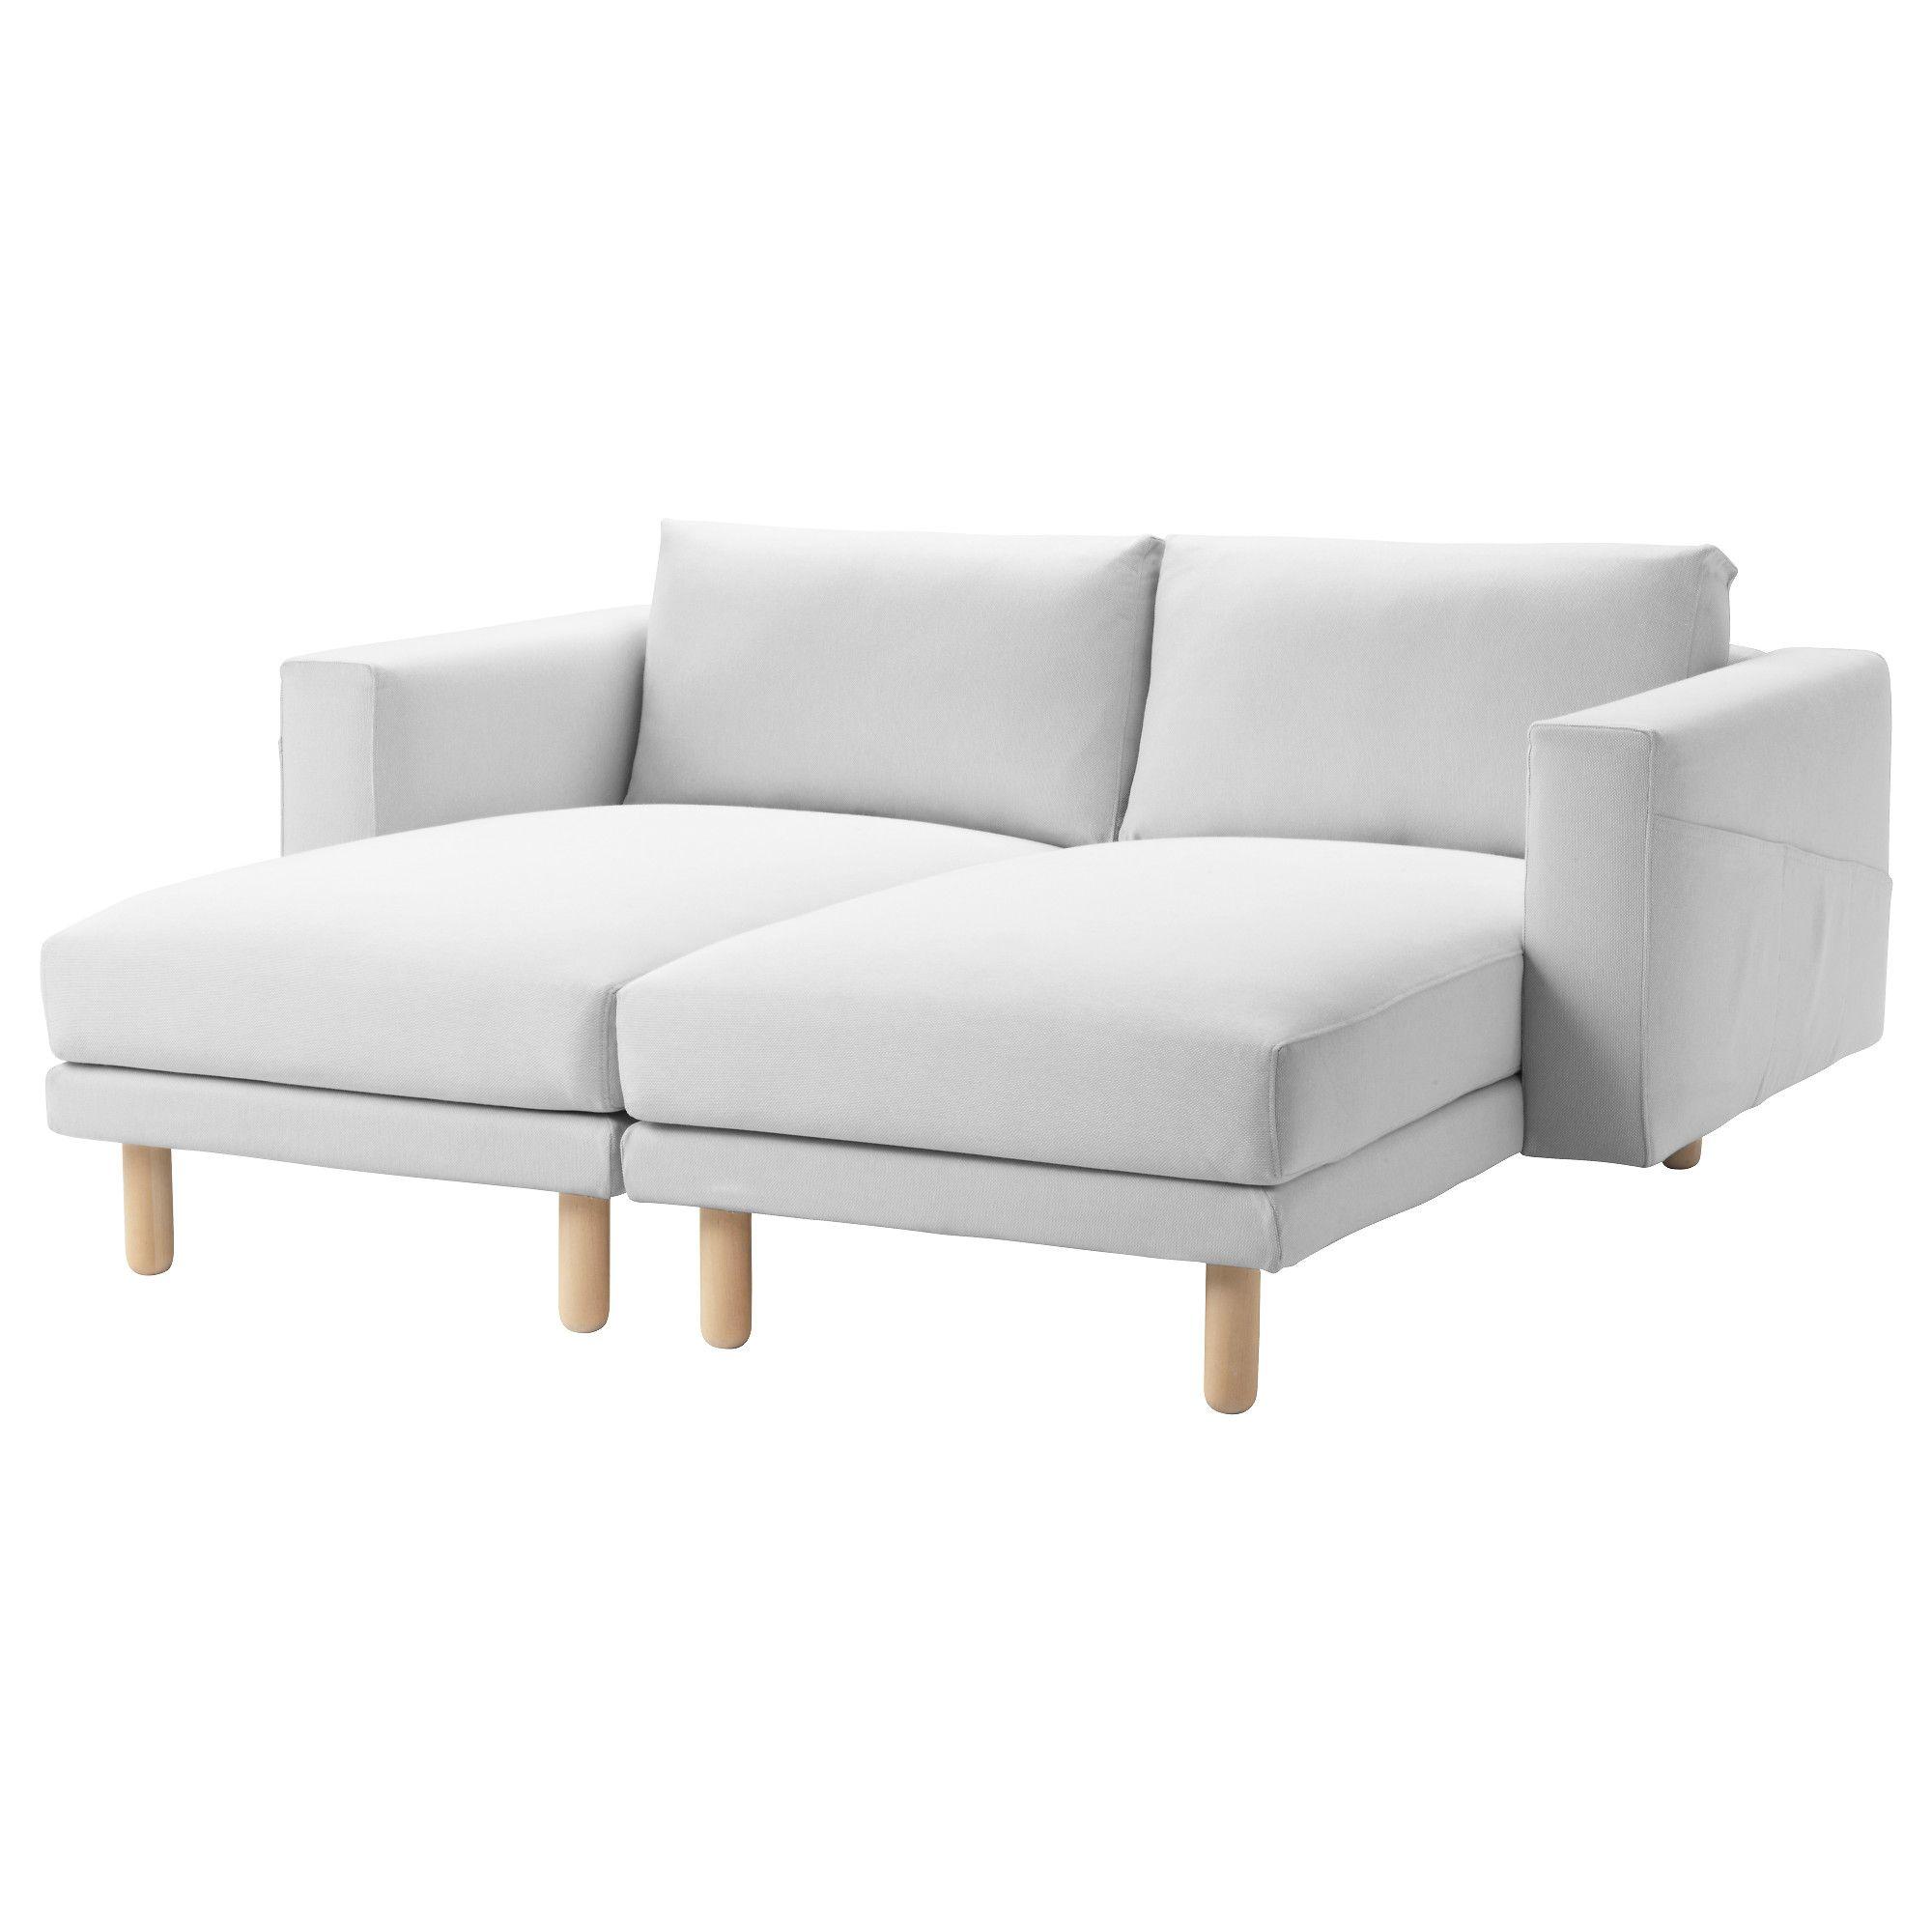 Ikea De Catalog Products S59125480